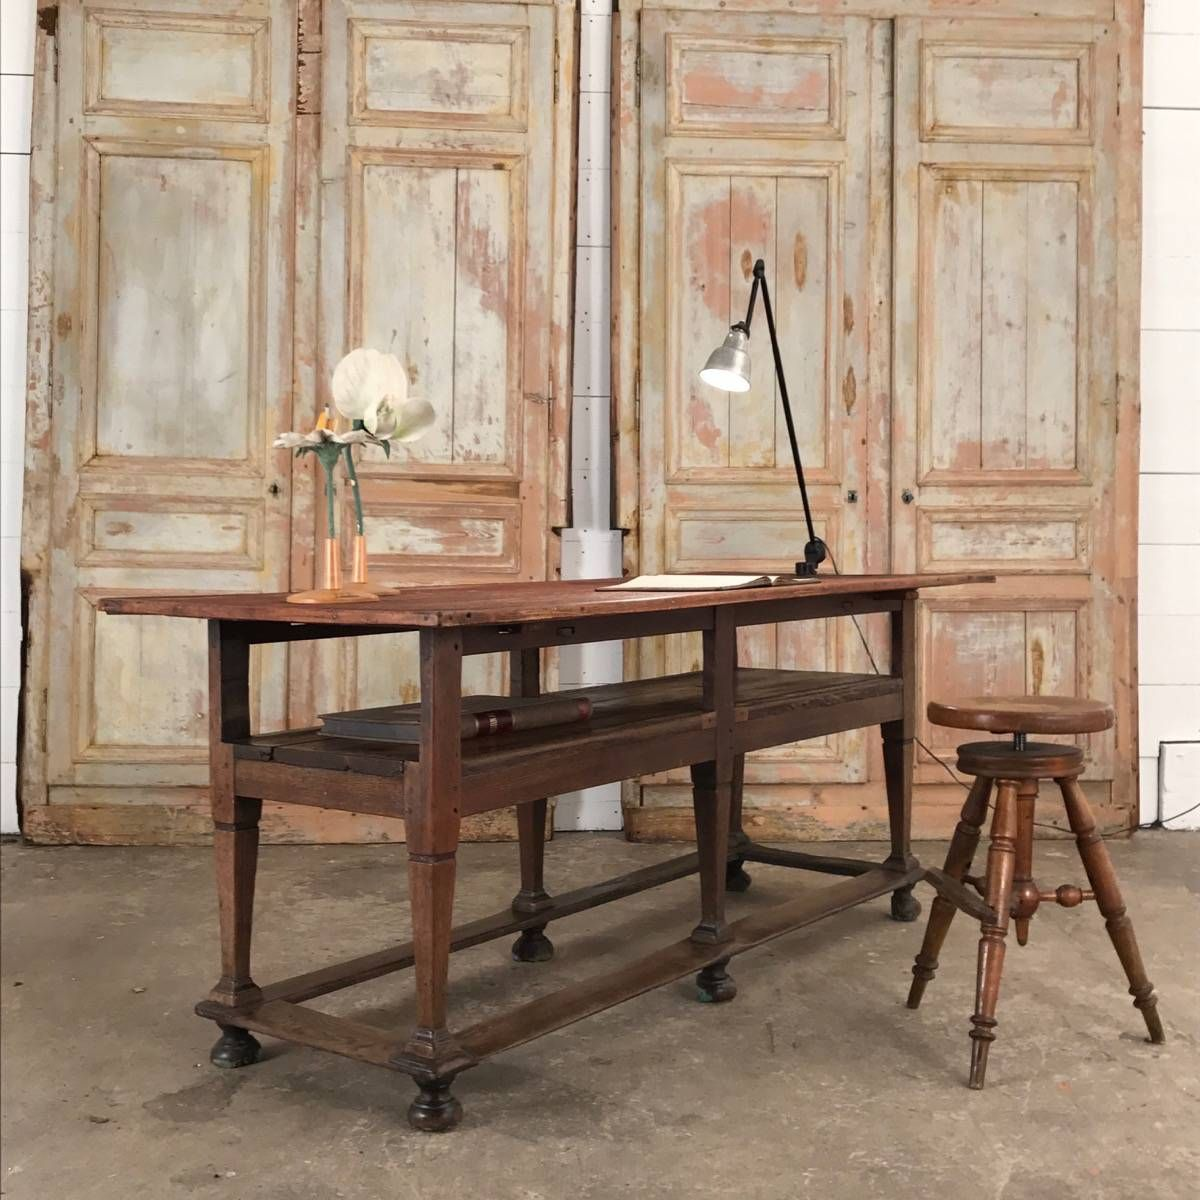 Curious Nice Shop Table Objet